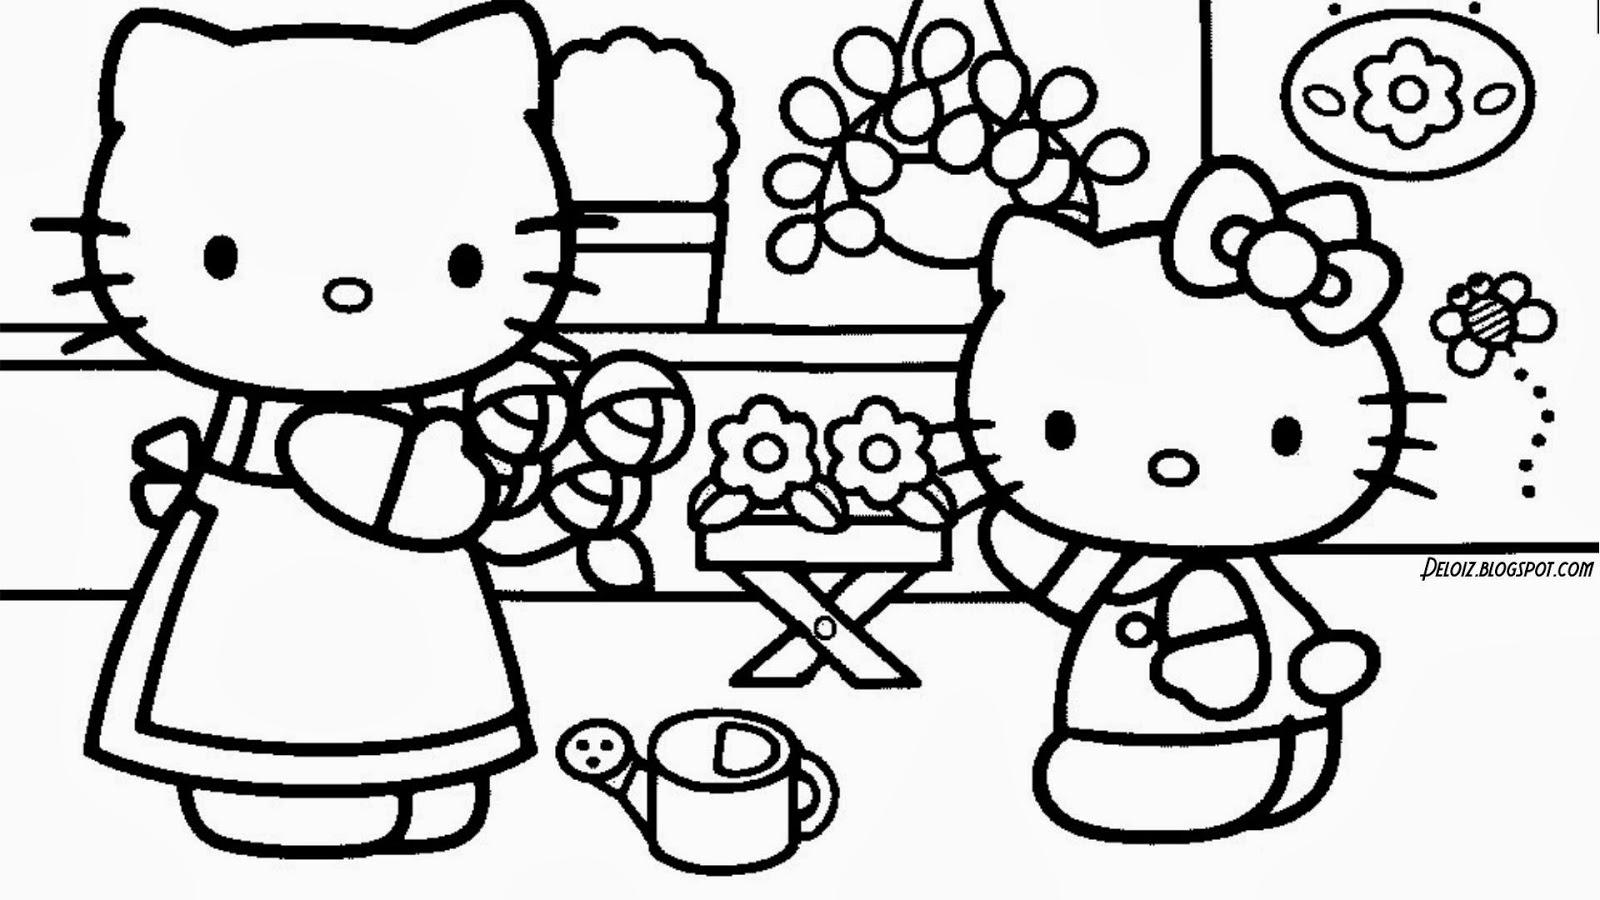 Gambar Hello Kitty Untuk Diwarnai Deloiz Wallpaper 1600x900